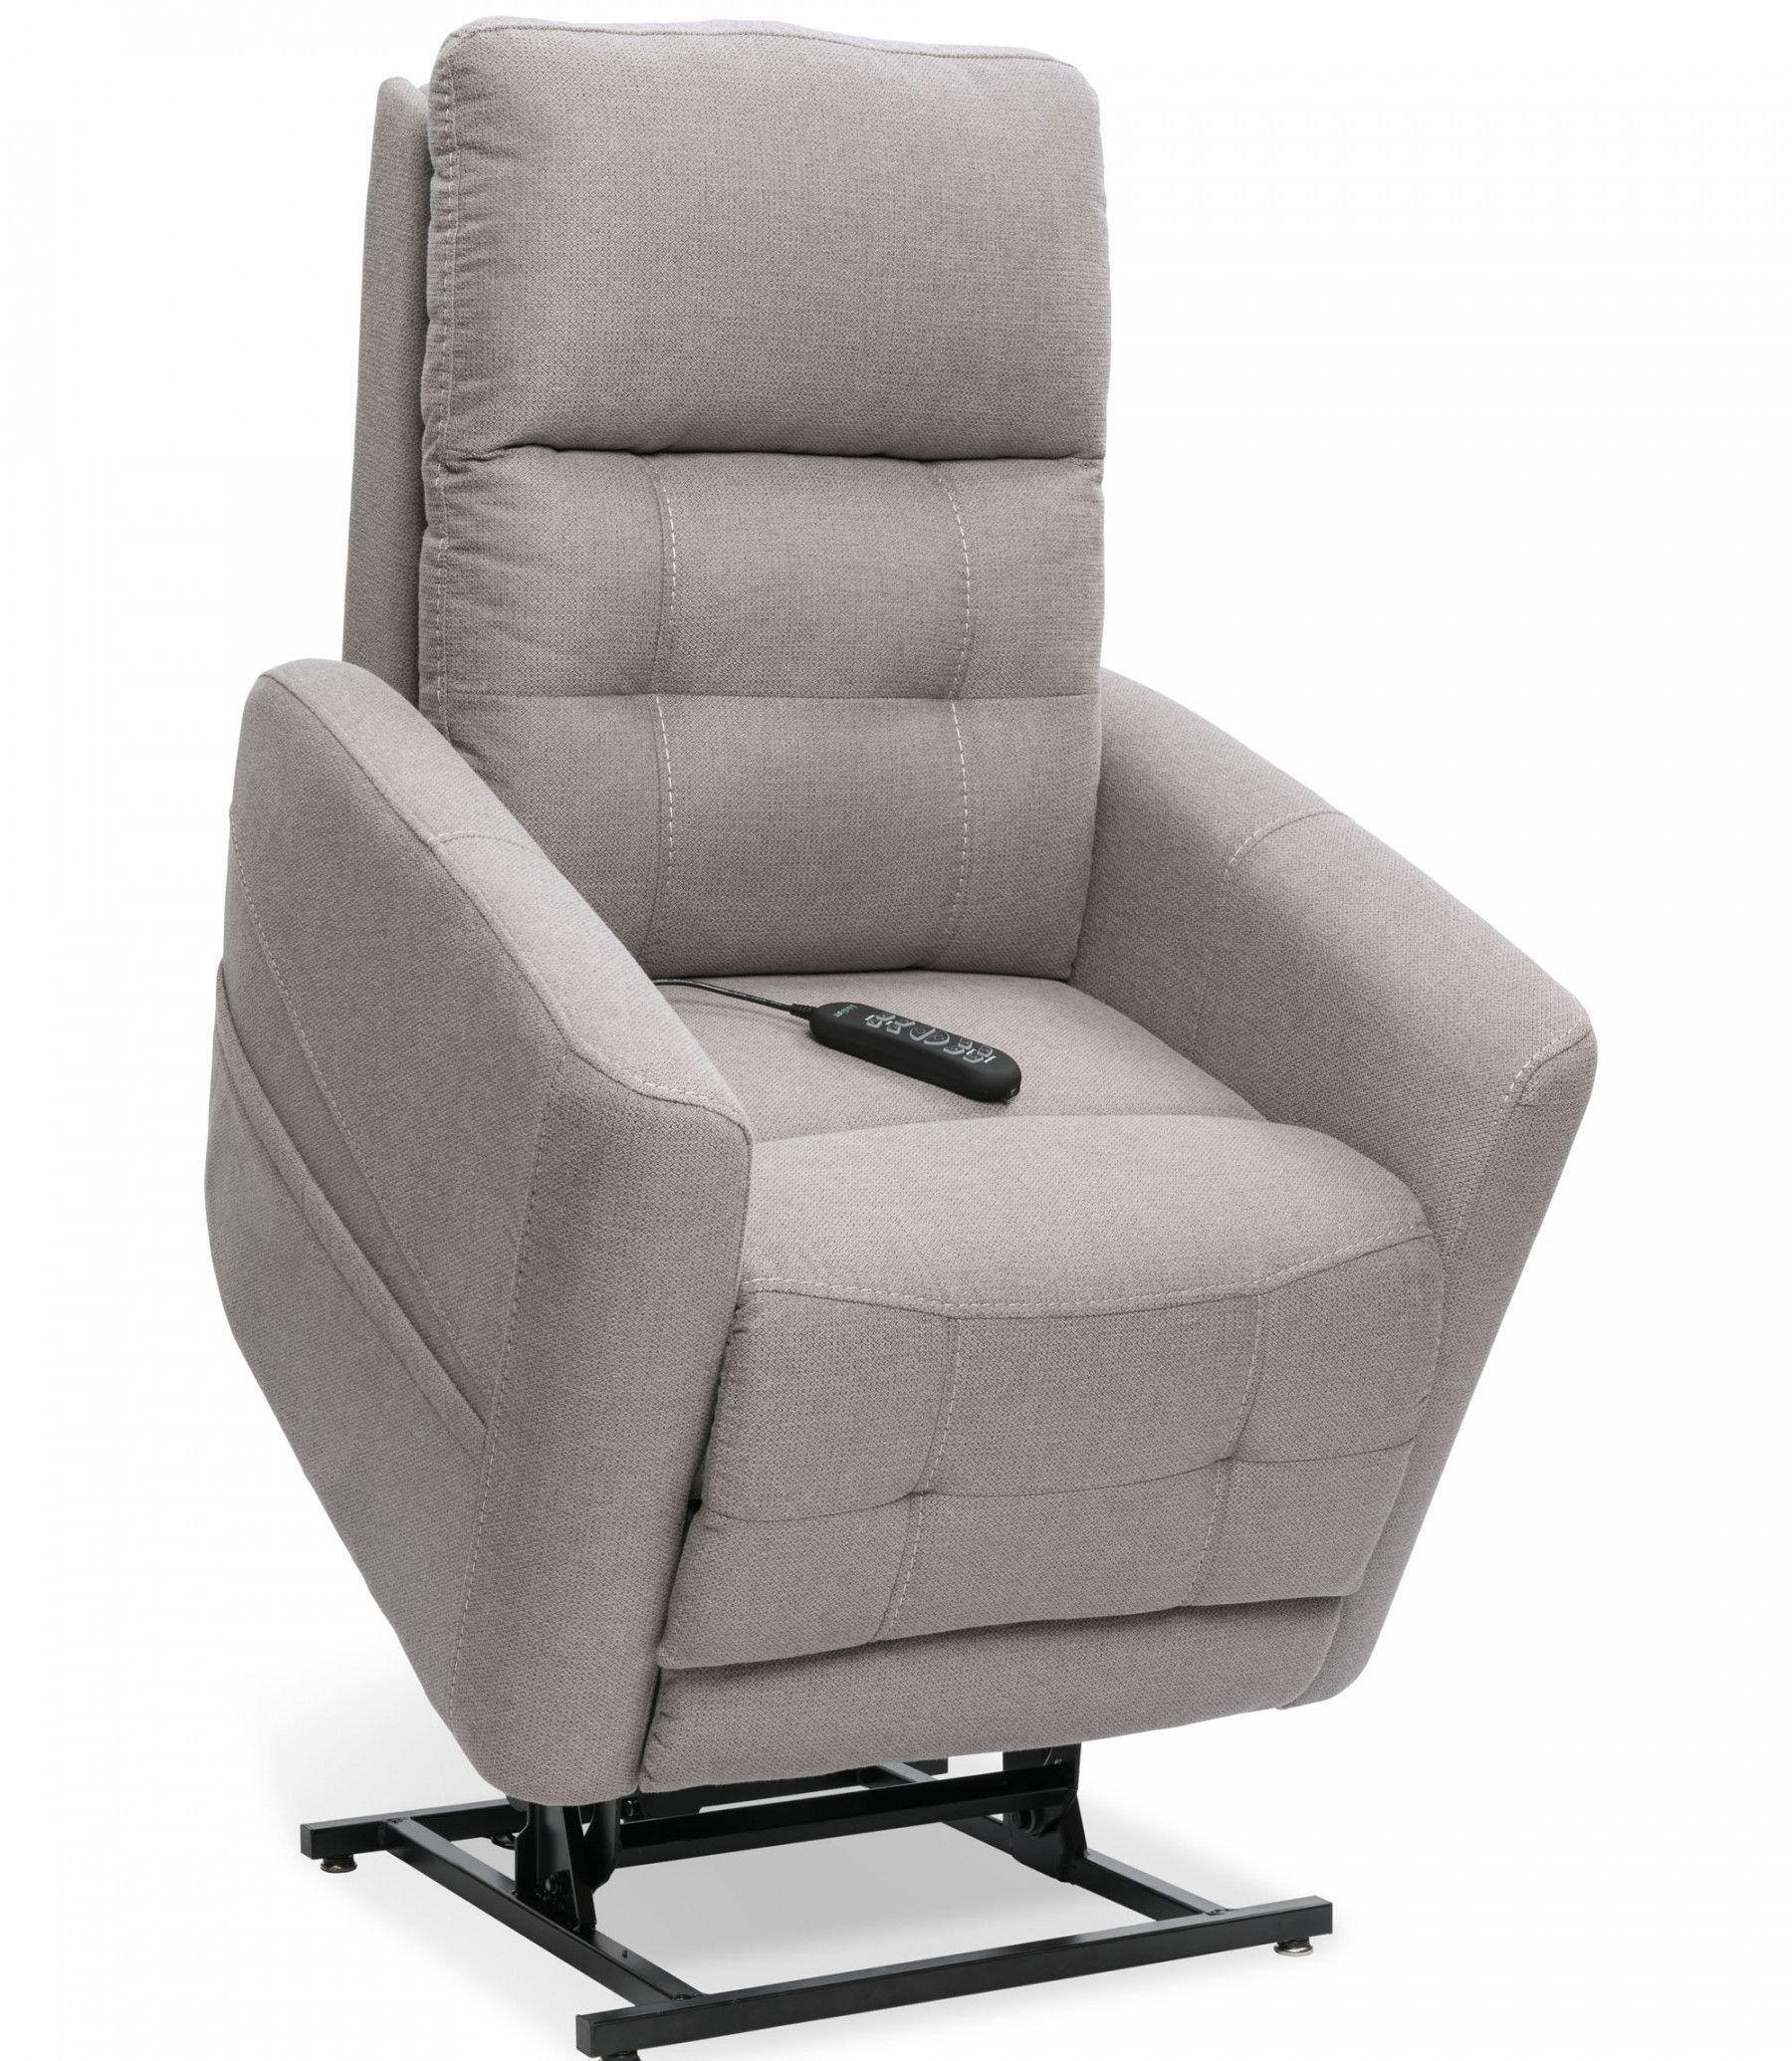 lift recliner chairs for sale steel chair magazine pride vivalift perfecta plr945 power viva powerrecliner liftchair electricrecliner